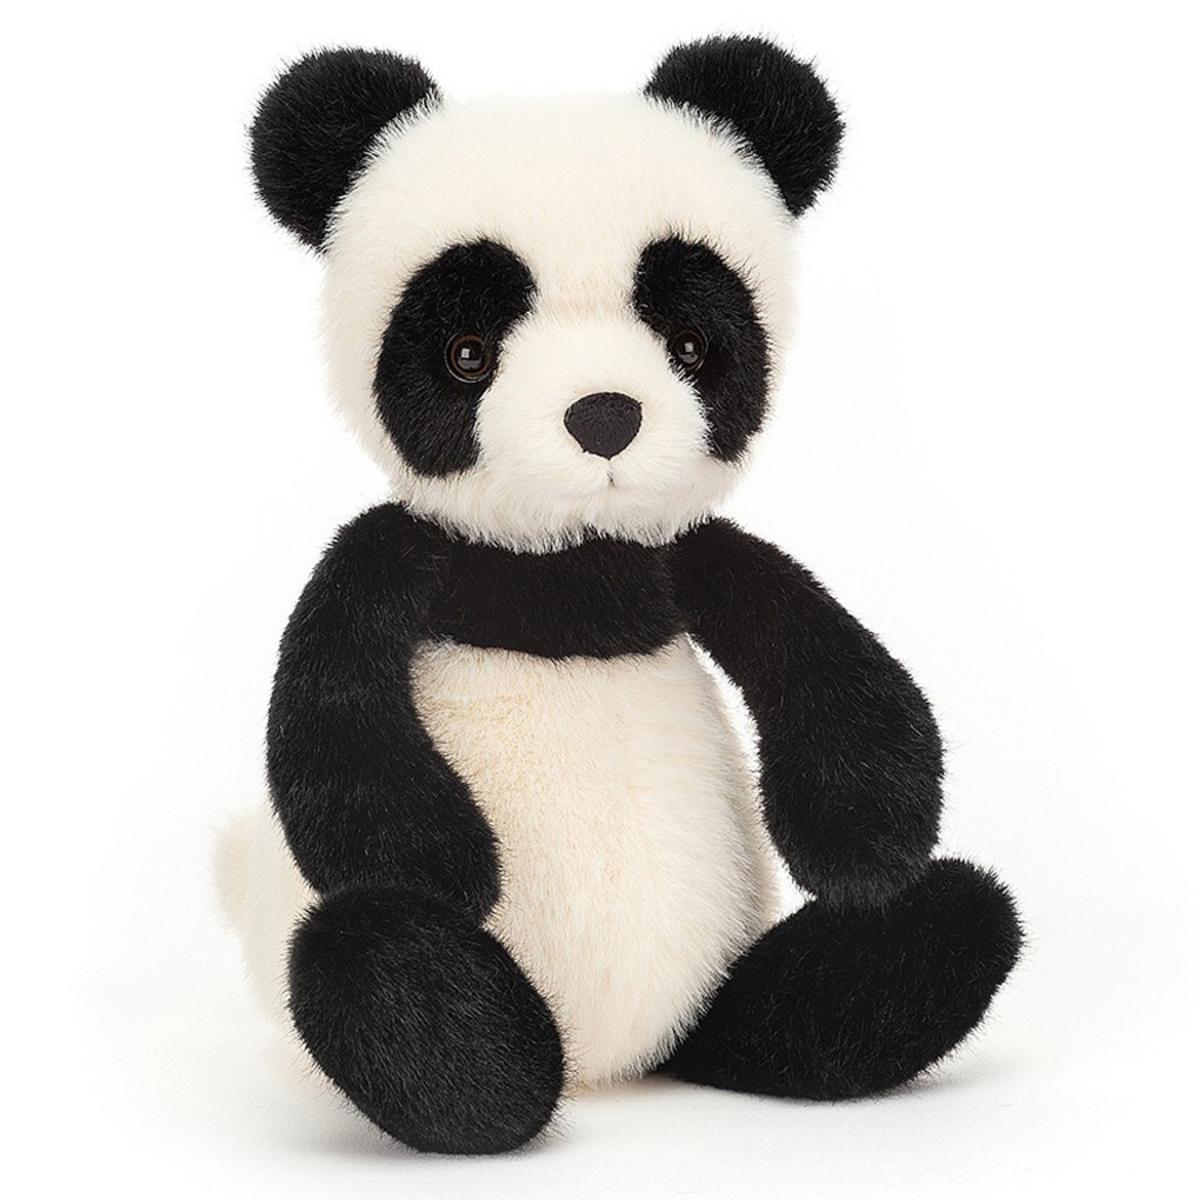 Peluche Whispit Panda Peluche Panda 26 cm